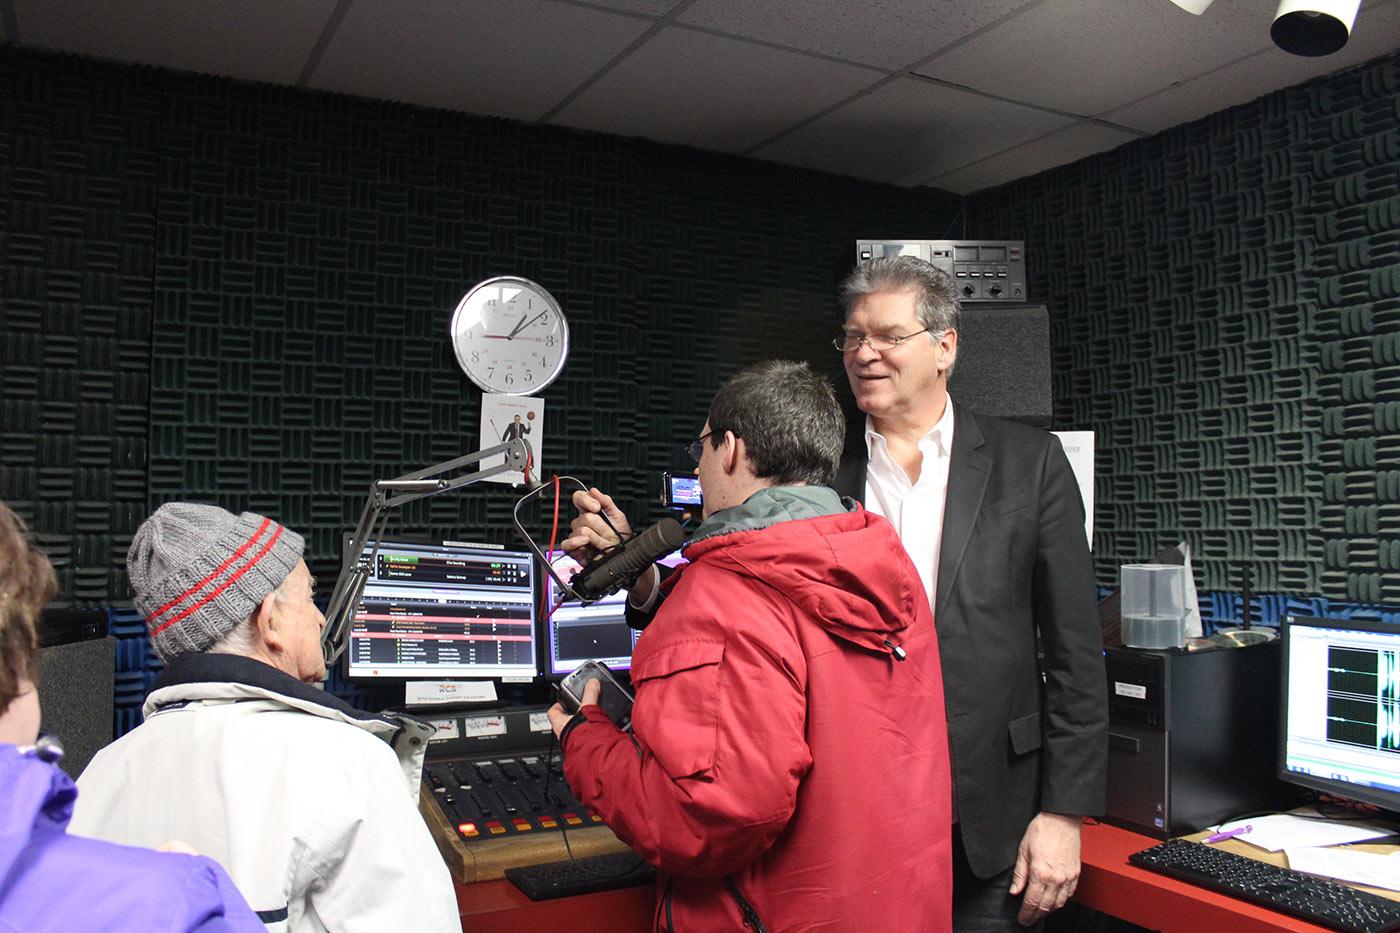 Man talking ibnto mic in radio booth